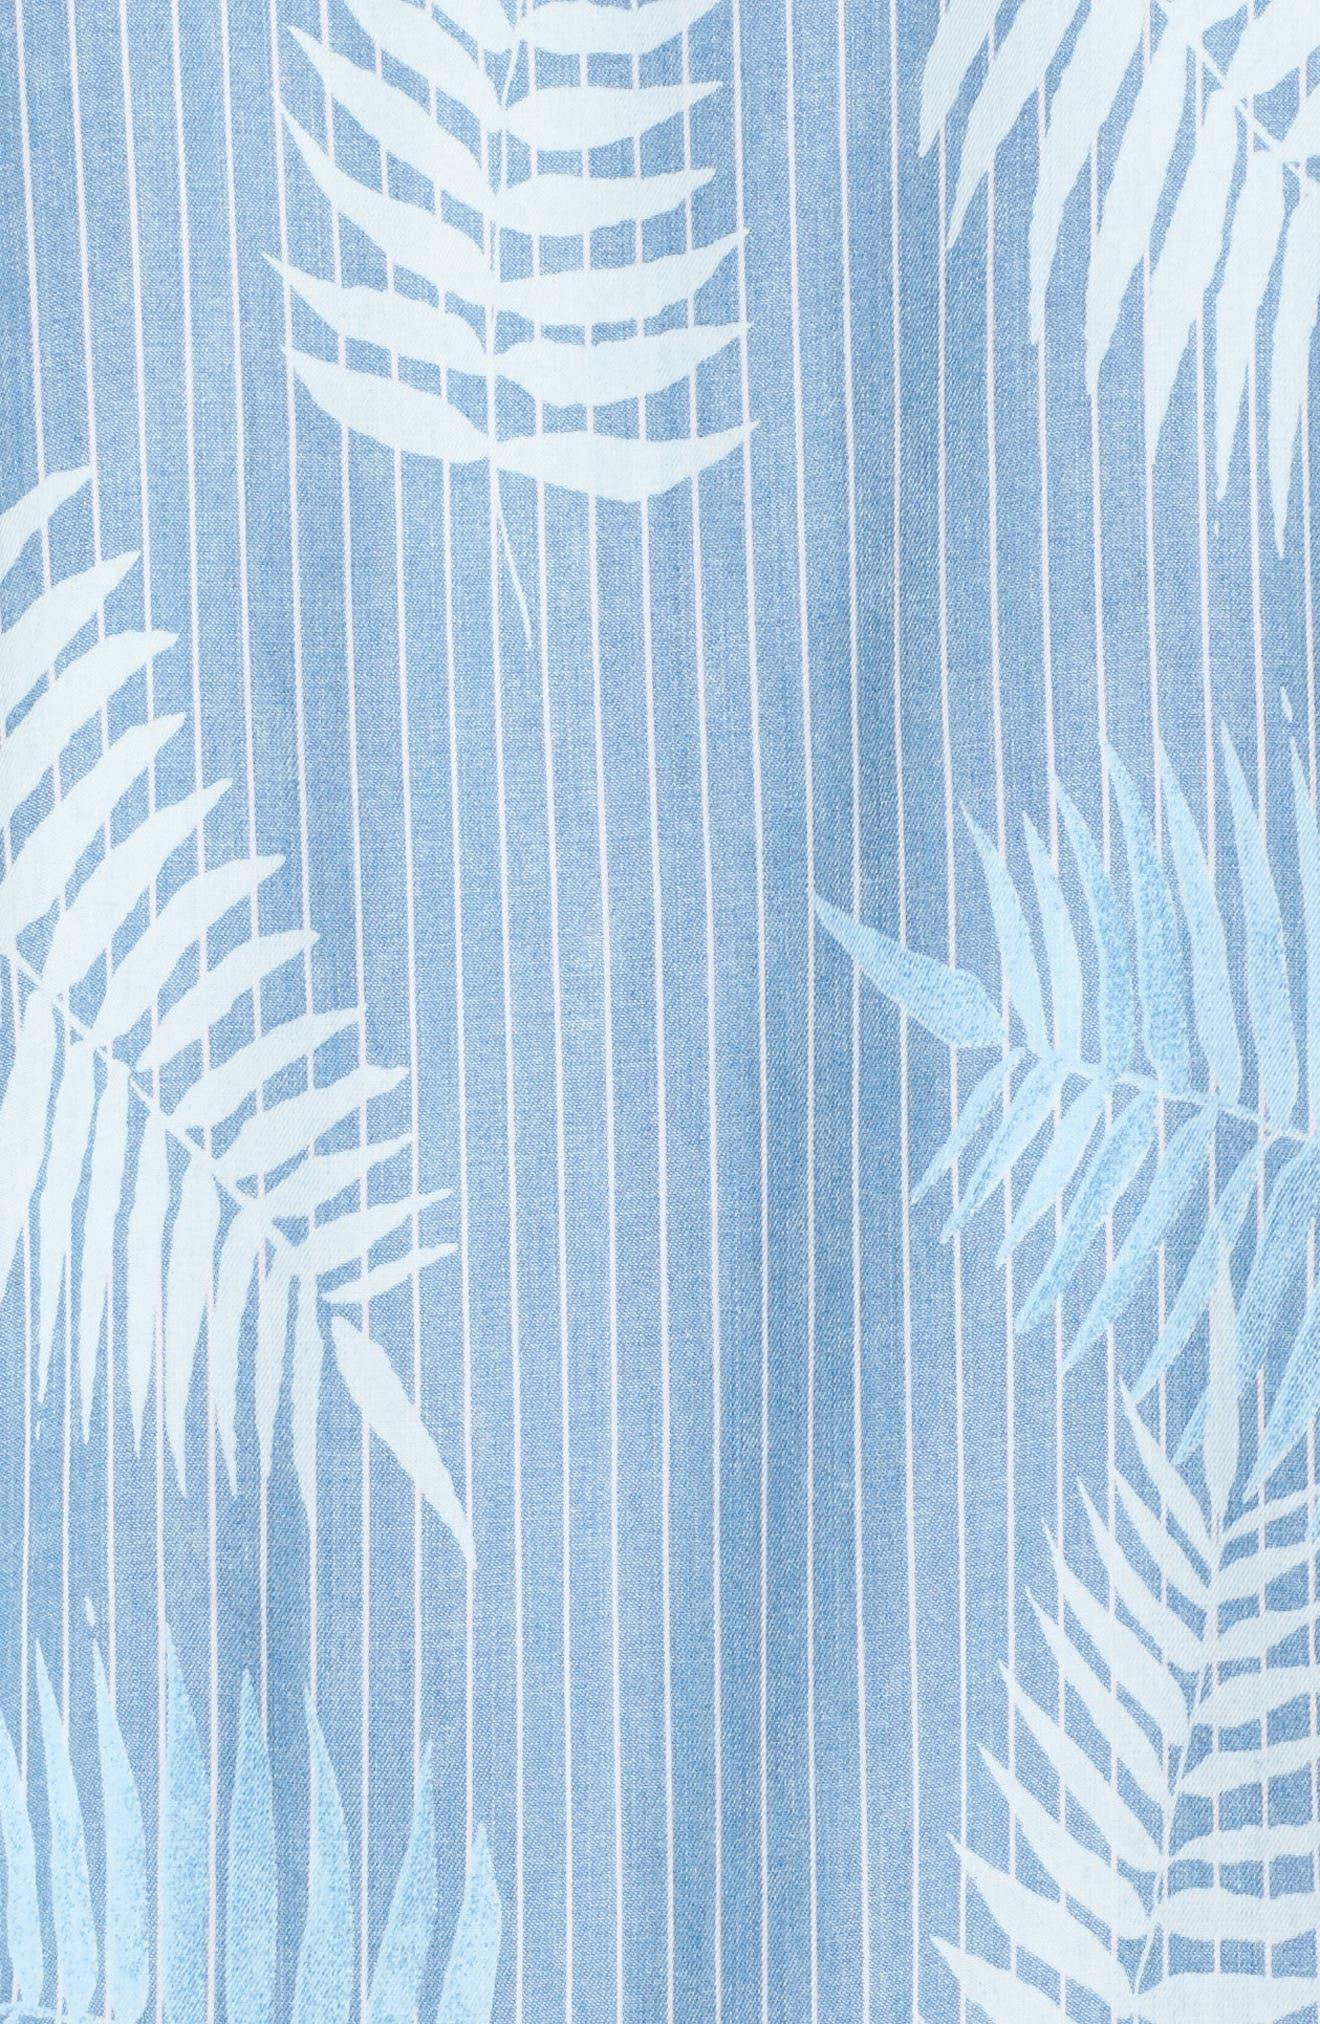 Tropical Breeze Bomber Jacket,                             Alternate thumbnail 7, color,                             BLUE TROPICAL BREEZE